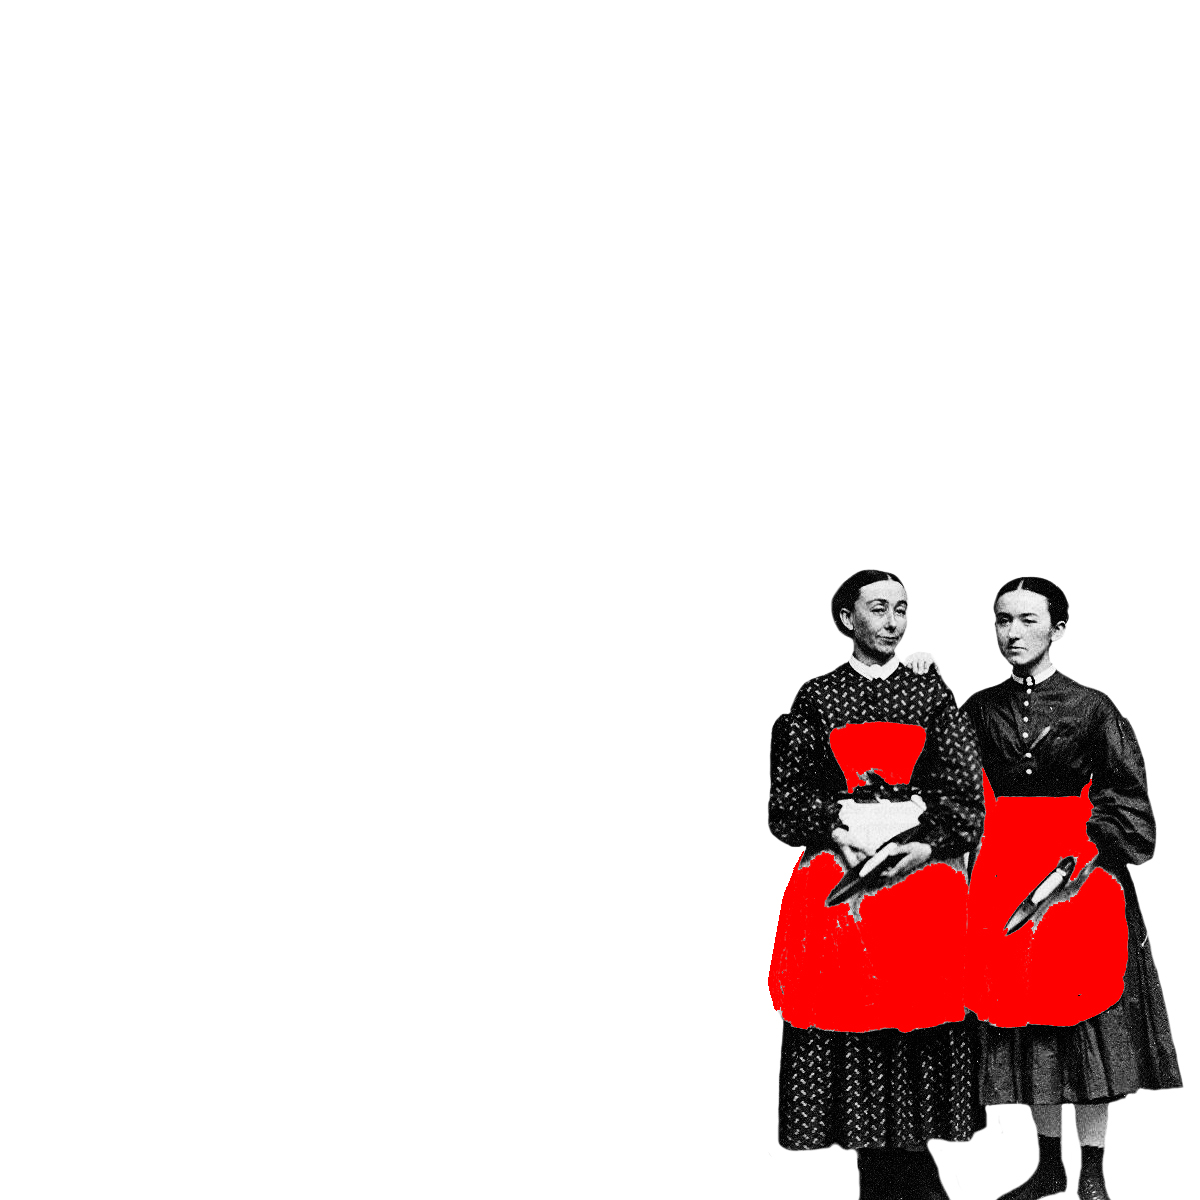 Porträt zweier Weberinnen aus dem Hause zoeppritz